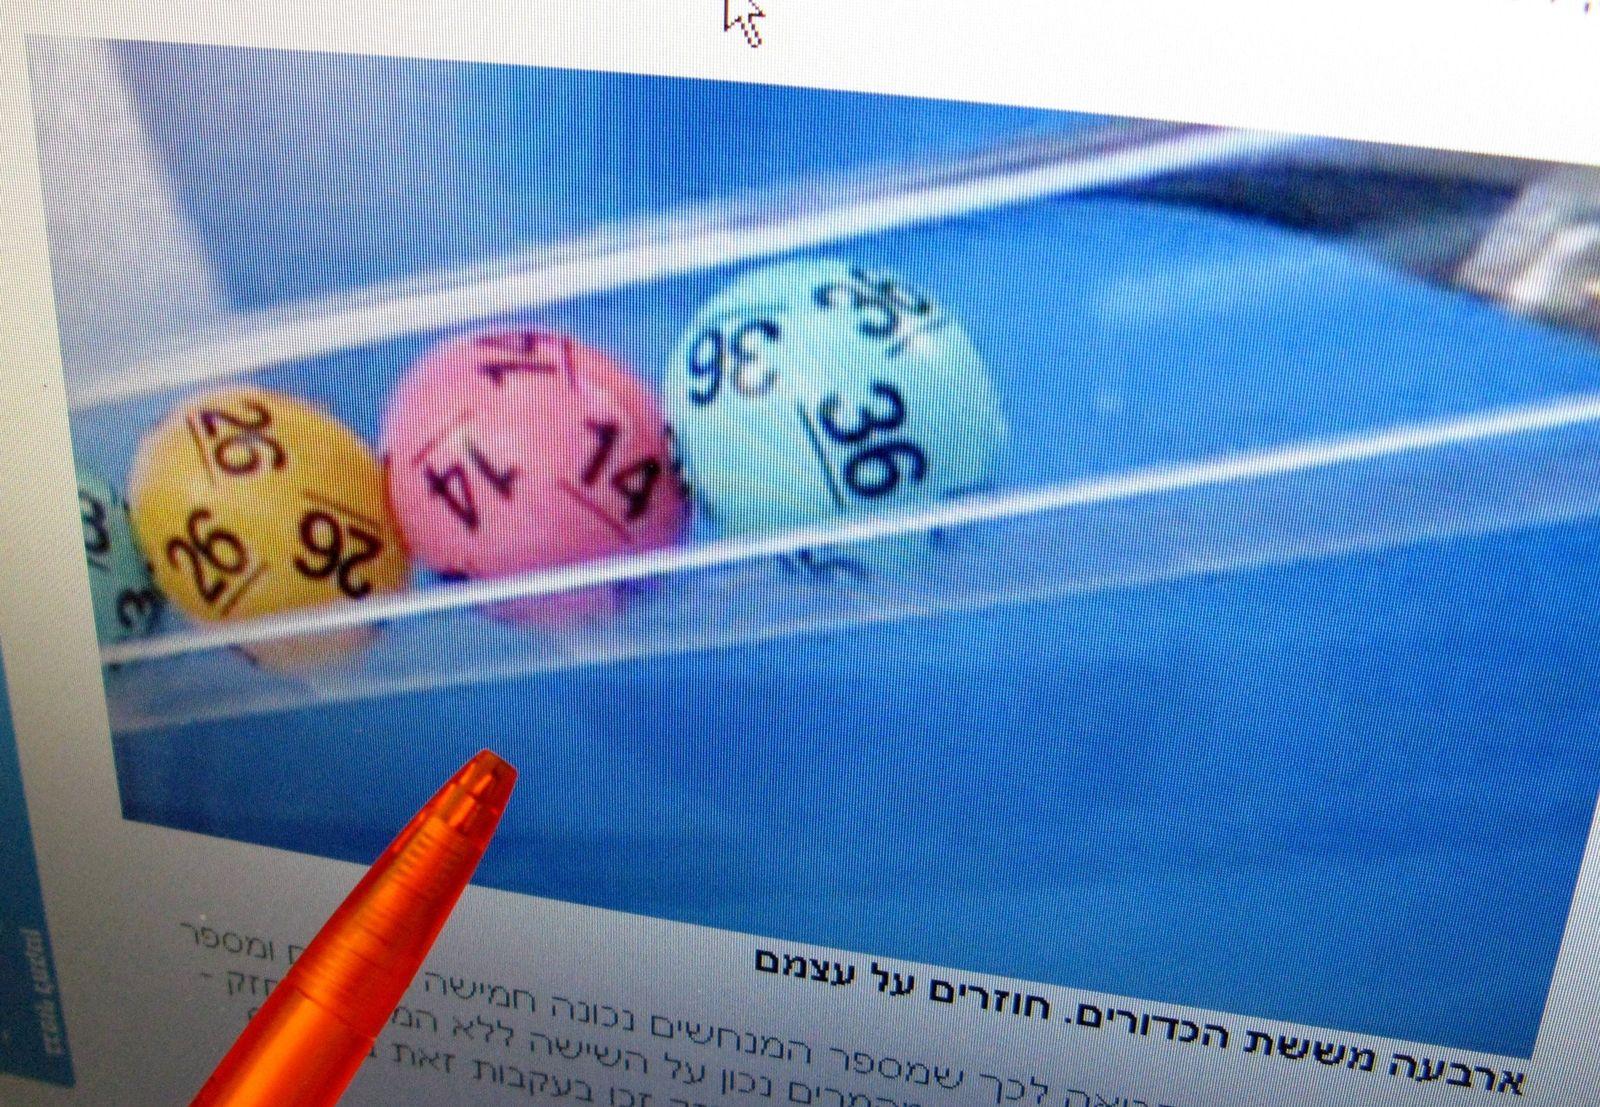 Lotto Israel